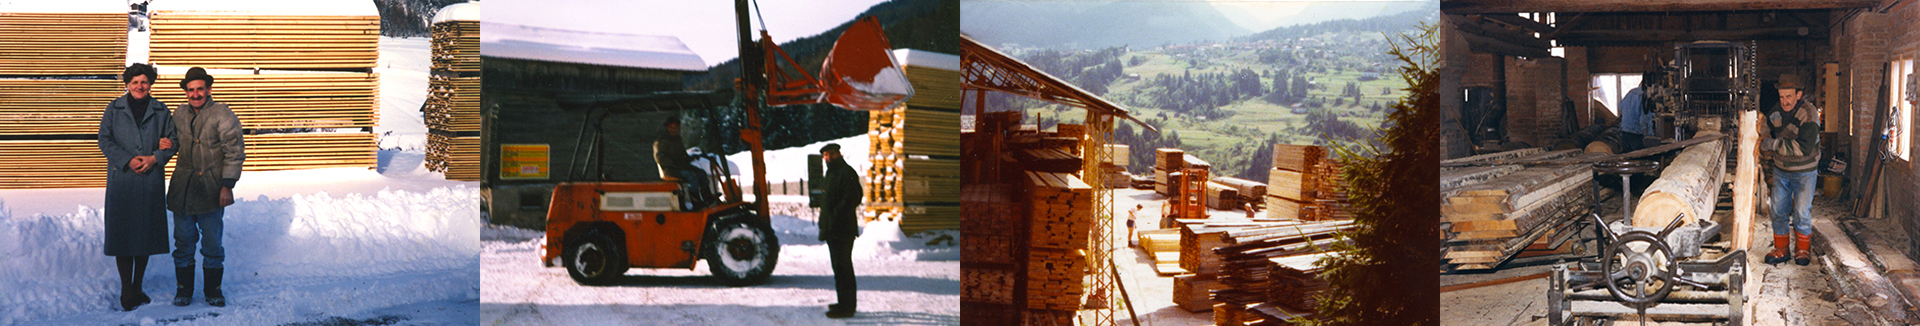 slide-generazioni-boscaioli